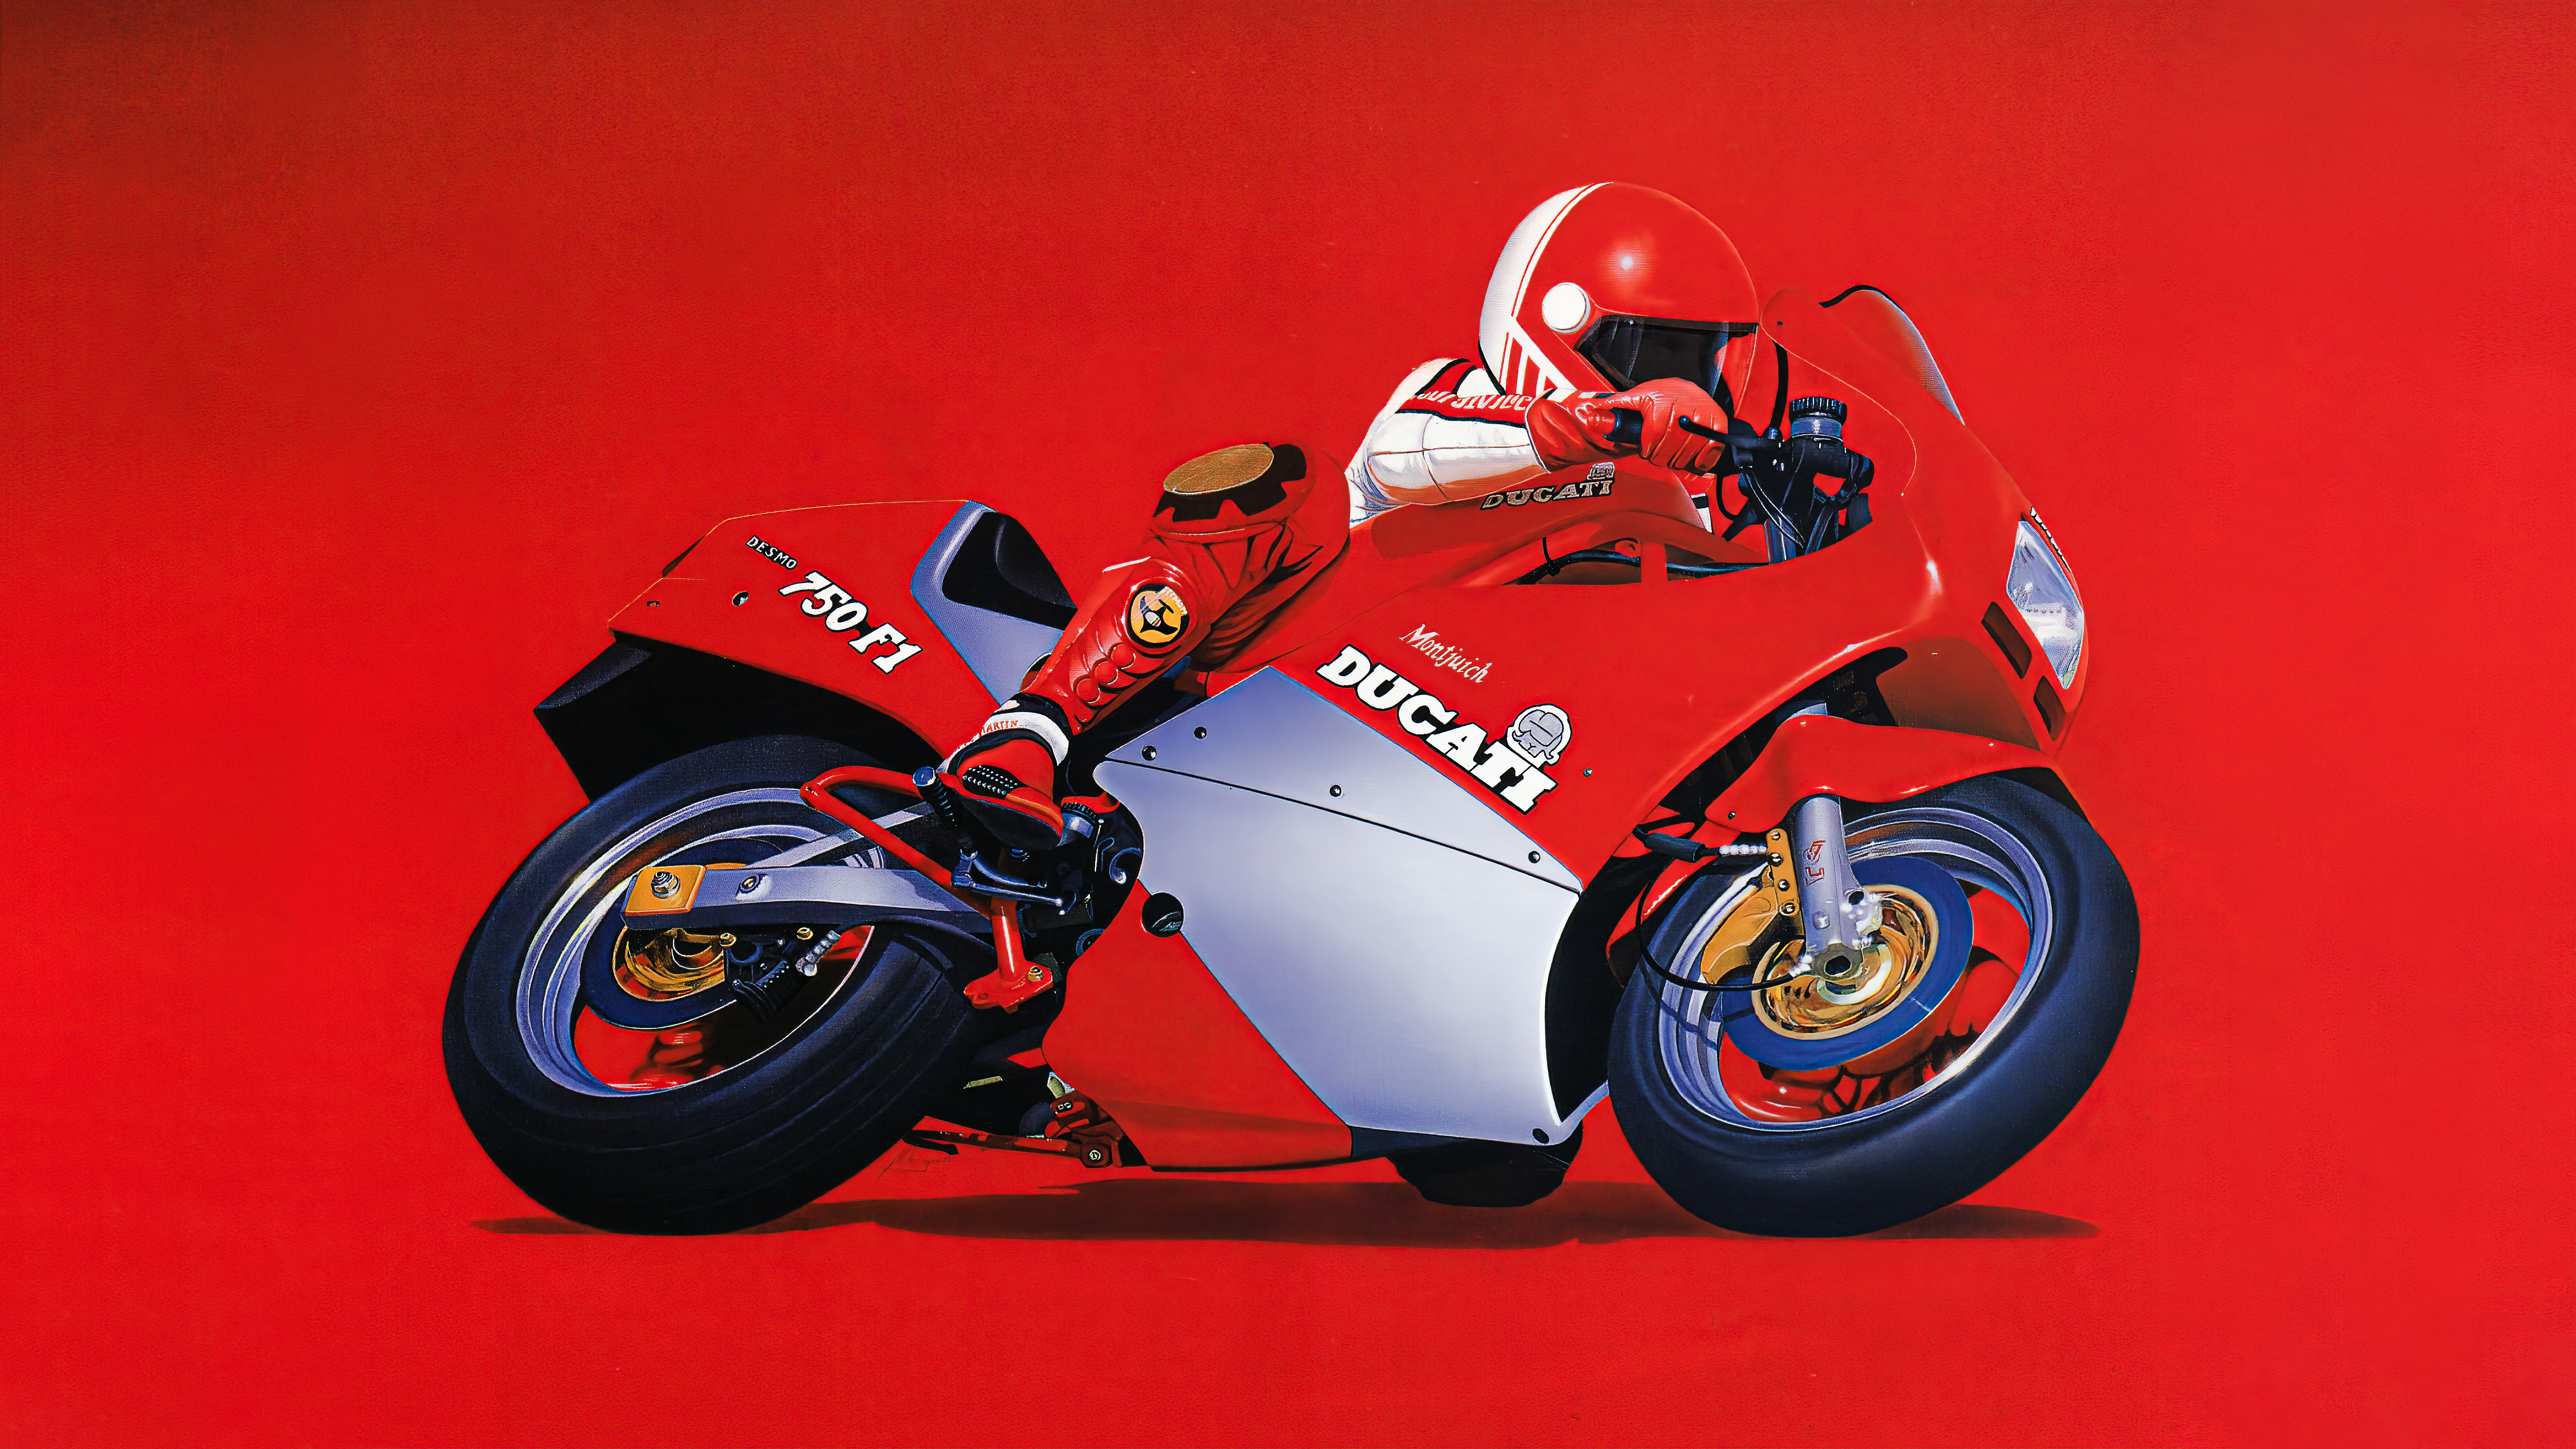 1986 ducati 750 f1 minimal 4k 1609016442 - 1986 Ducati 750 F1 Minimal 4k - 1986 Ducati 750 F1 Minimal 4k wallpaper